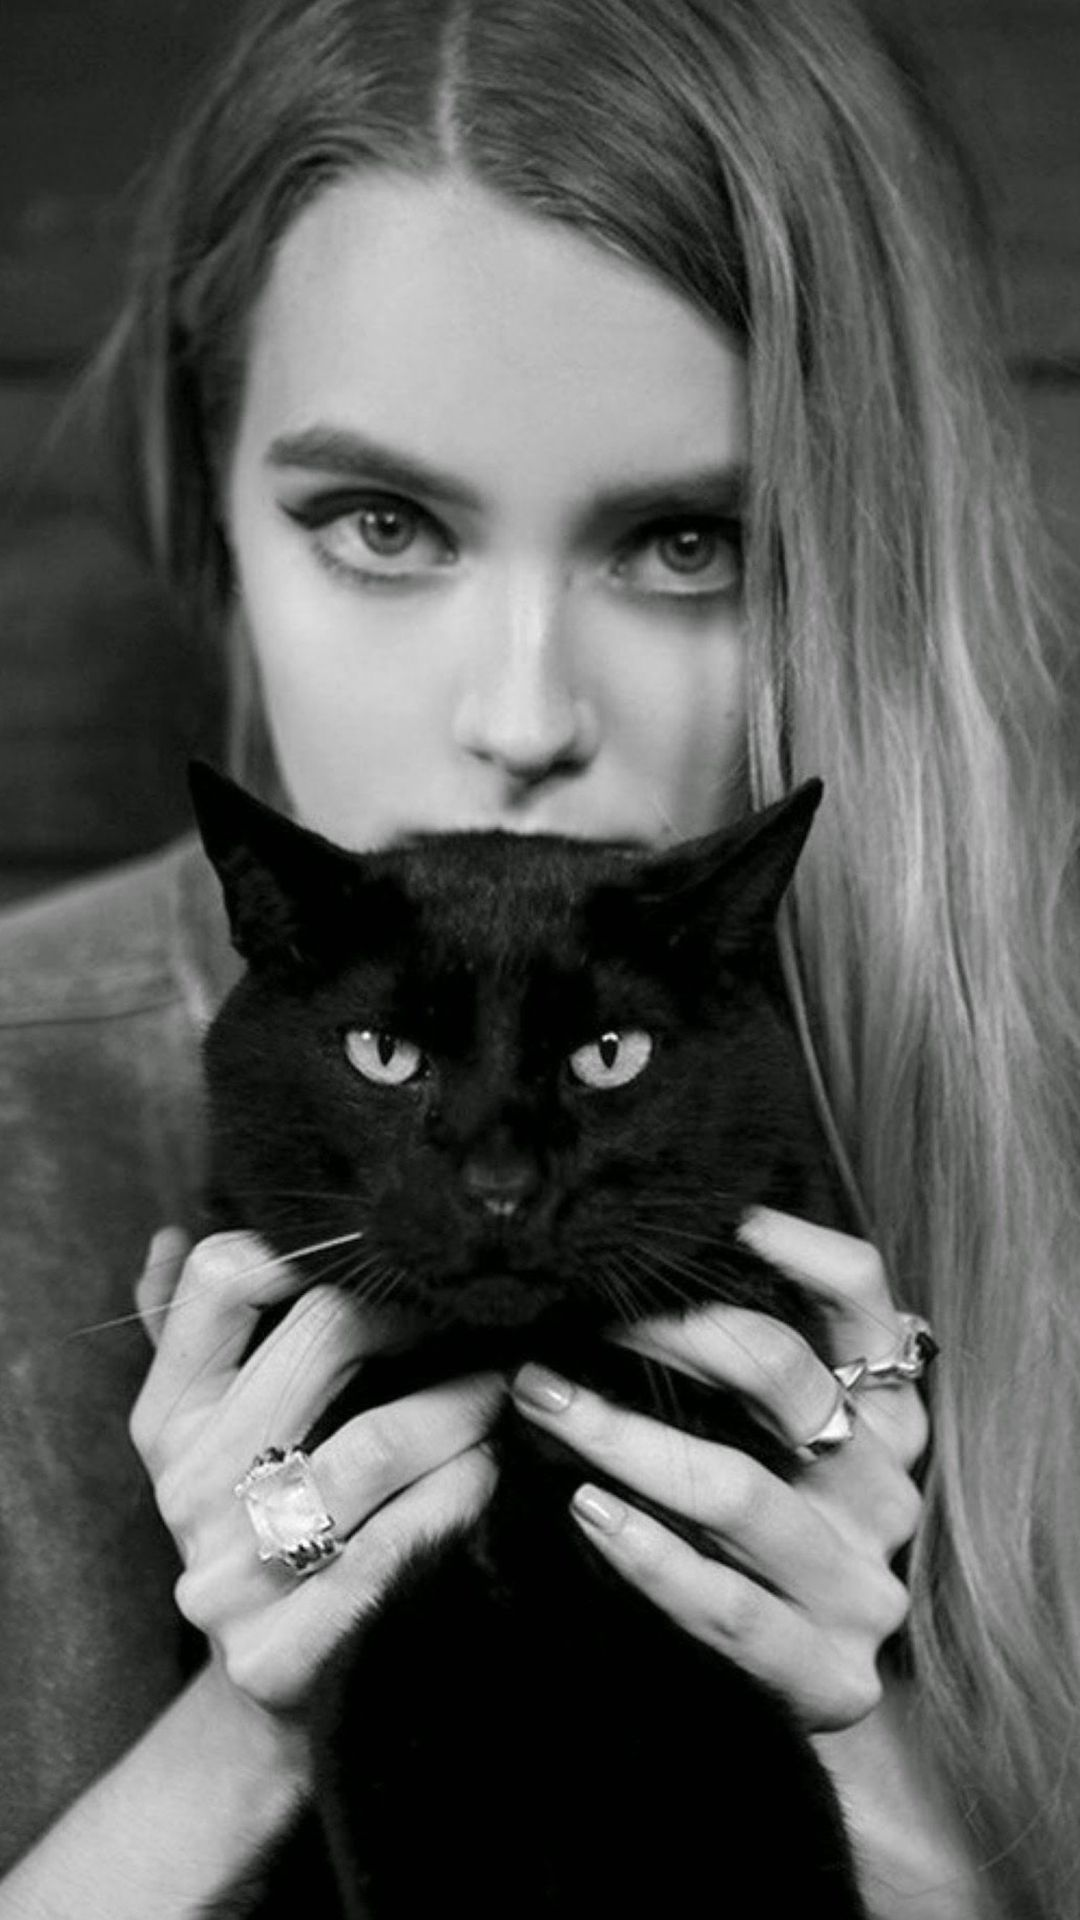 Iphone 6 wallpaper tumblr girl - Blonde Girl With Black Cat Iphone 6 Plus Wallpaper